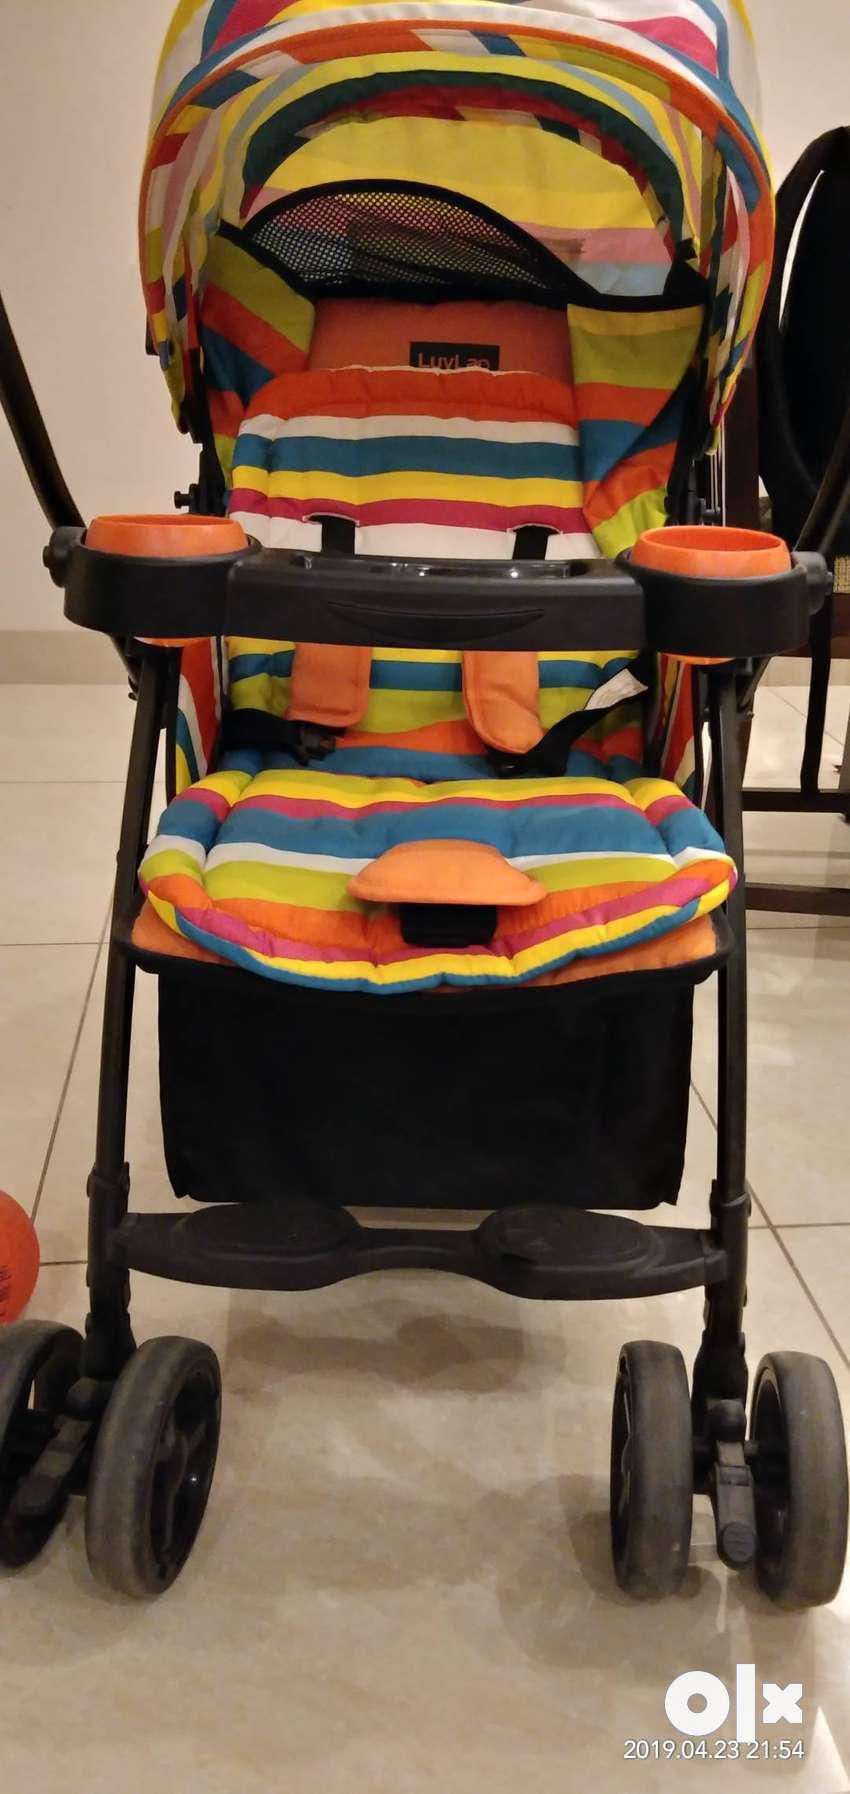 Luvlap baby stroller pram 0